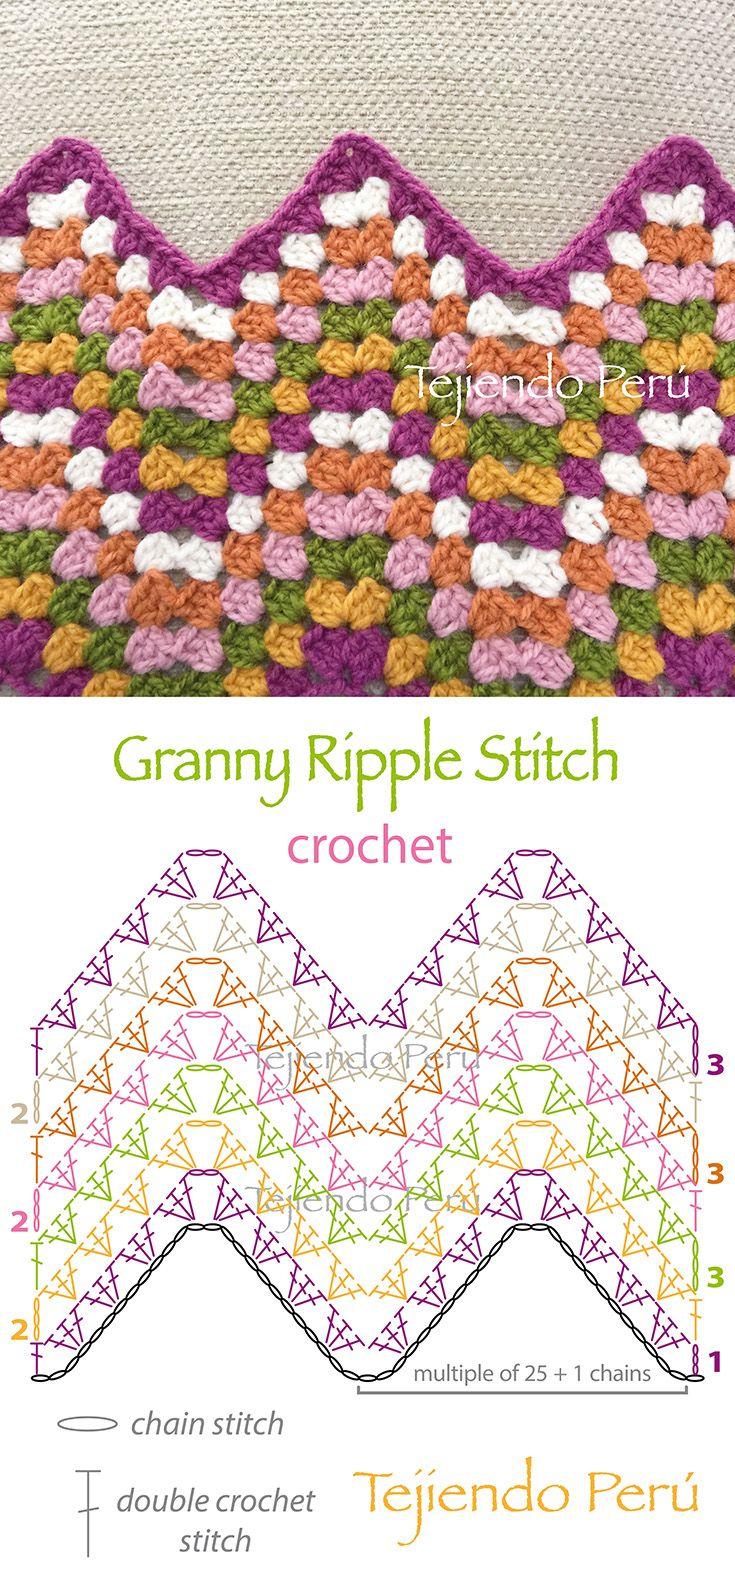 Crochet granny ripple stitch diagram or pattern! Mantas